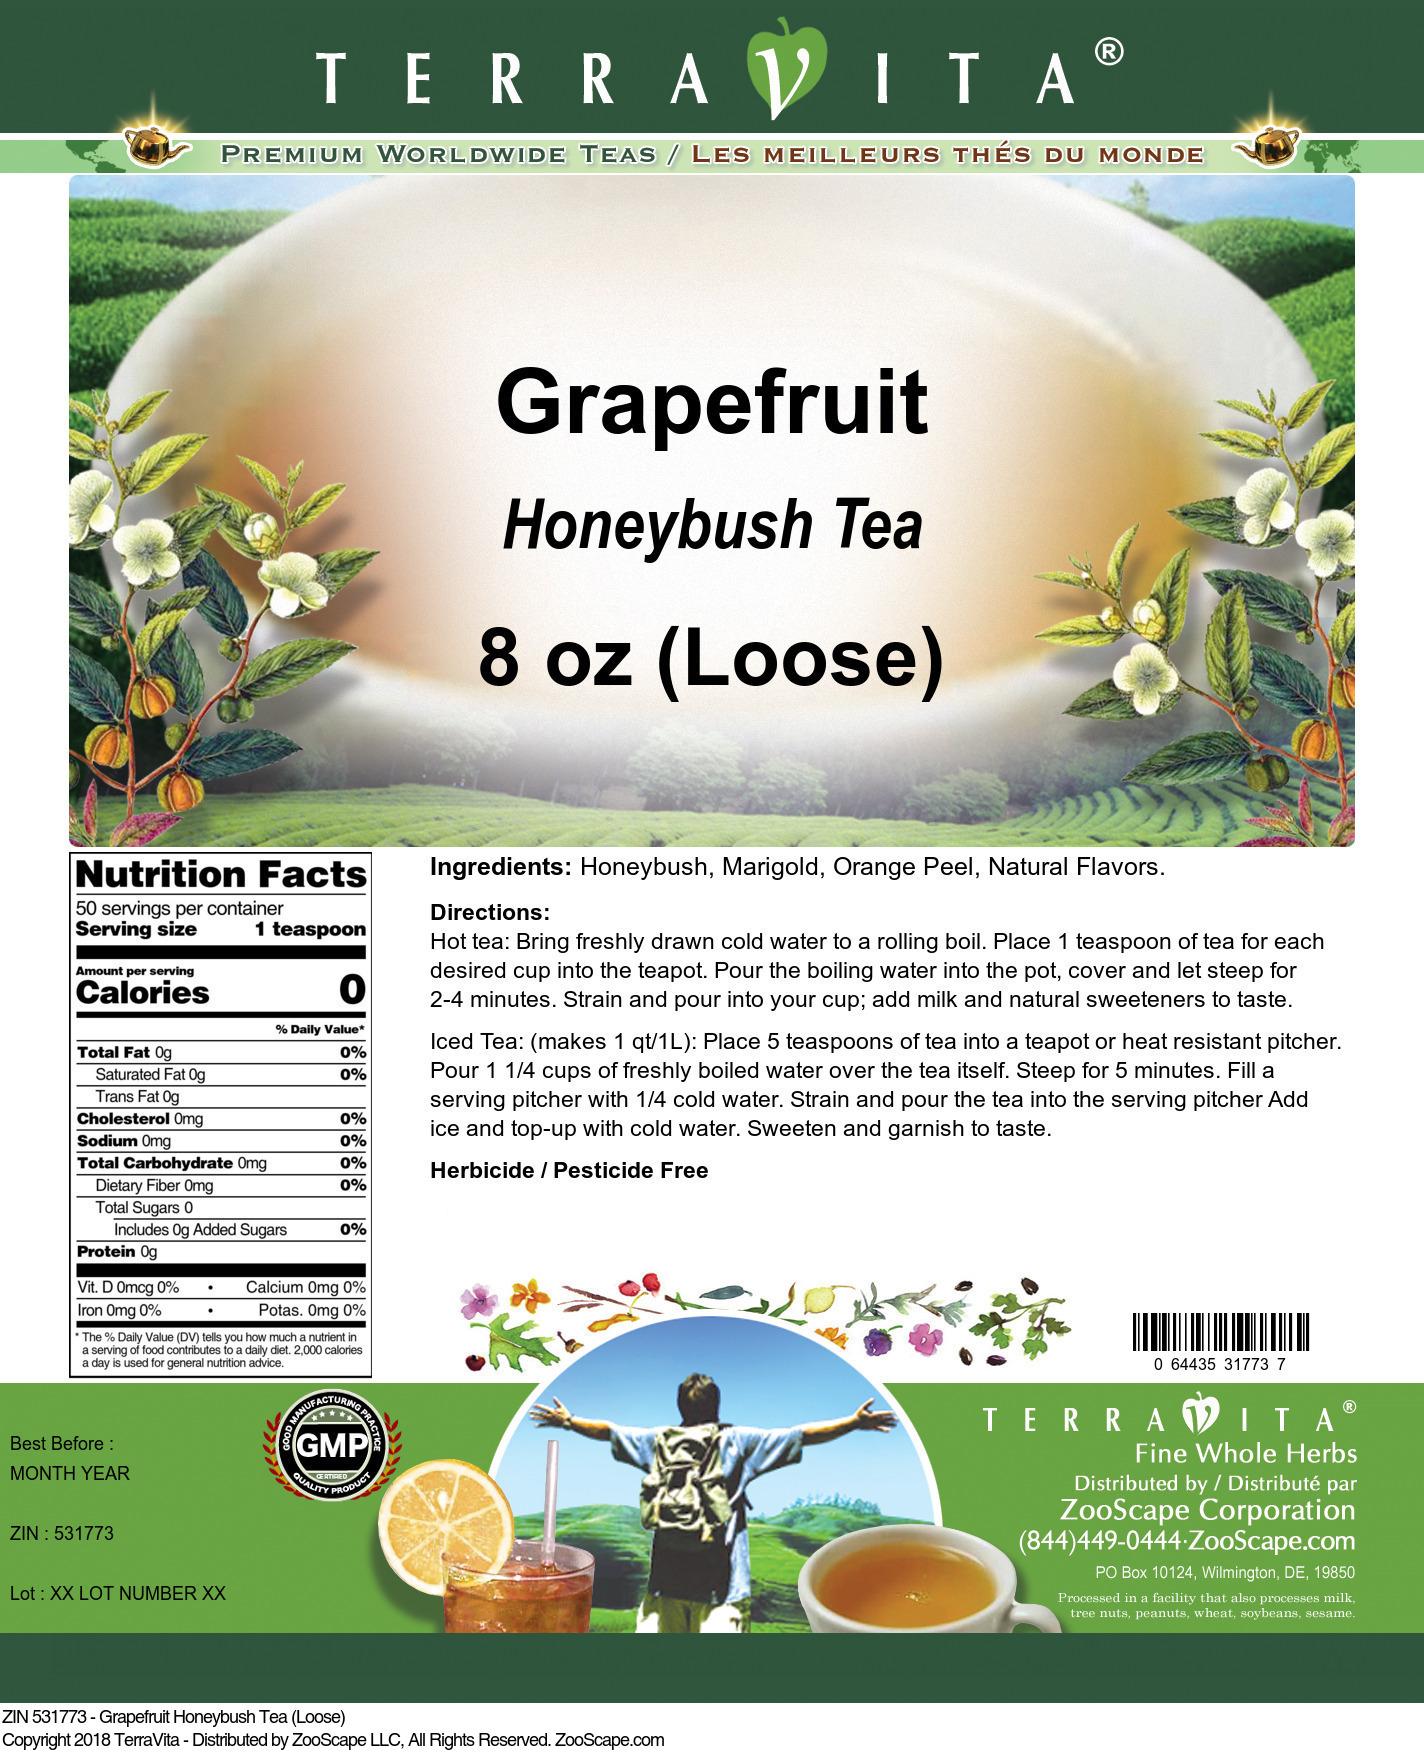 Grapefruit Honeybush Tea (Loose)